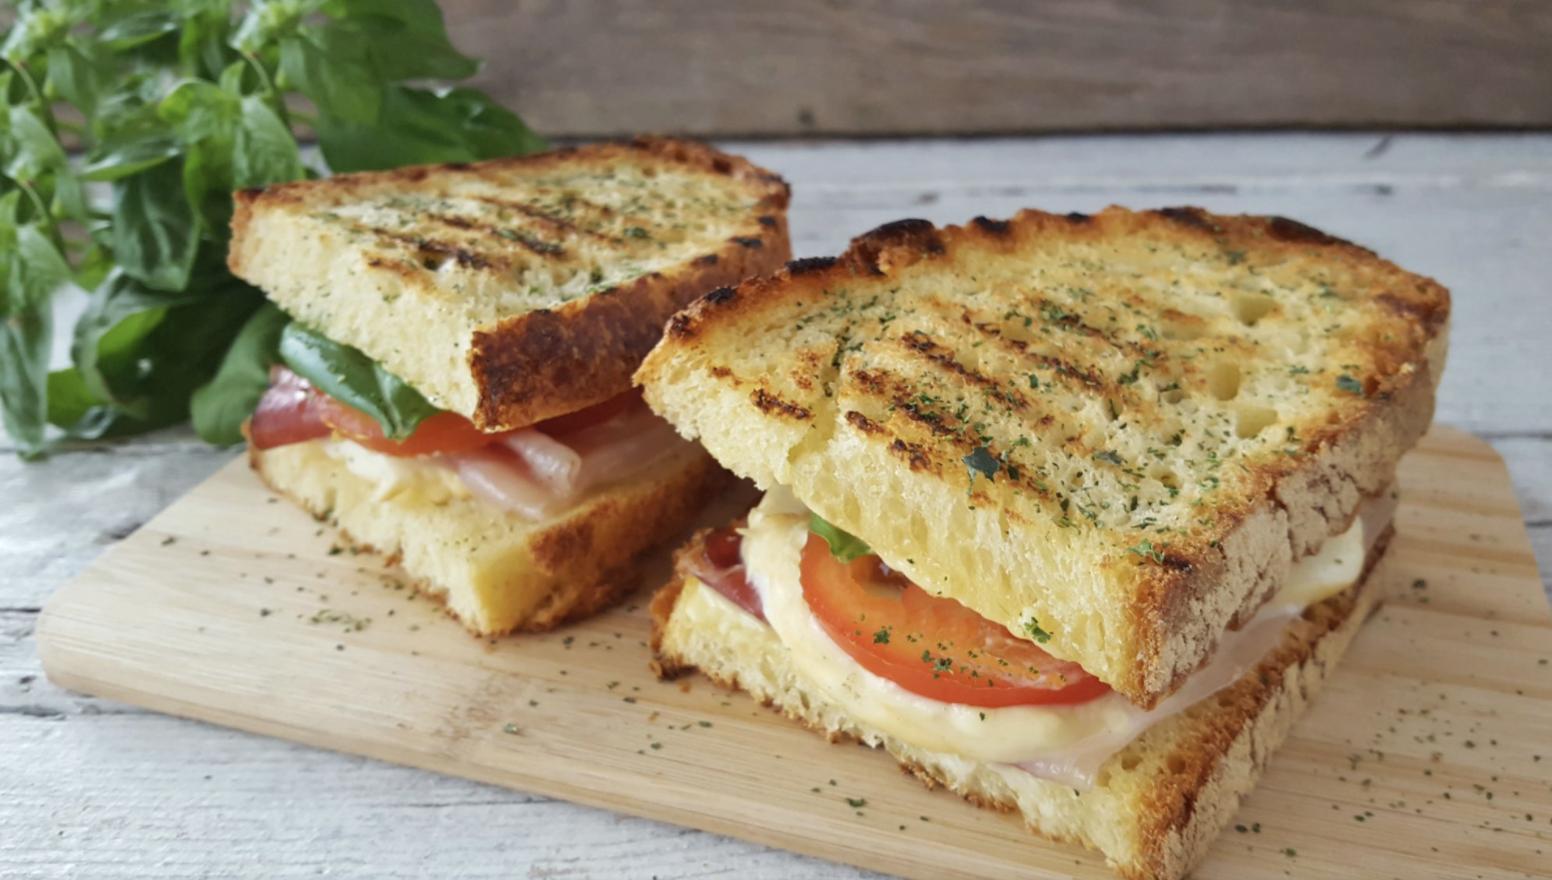 La zingara sandwich: perfection in a very simple recipe